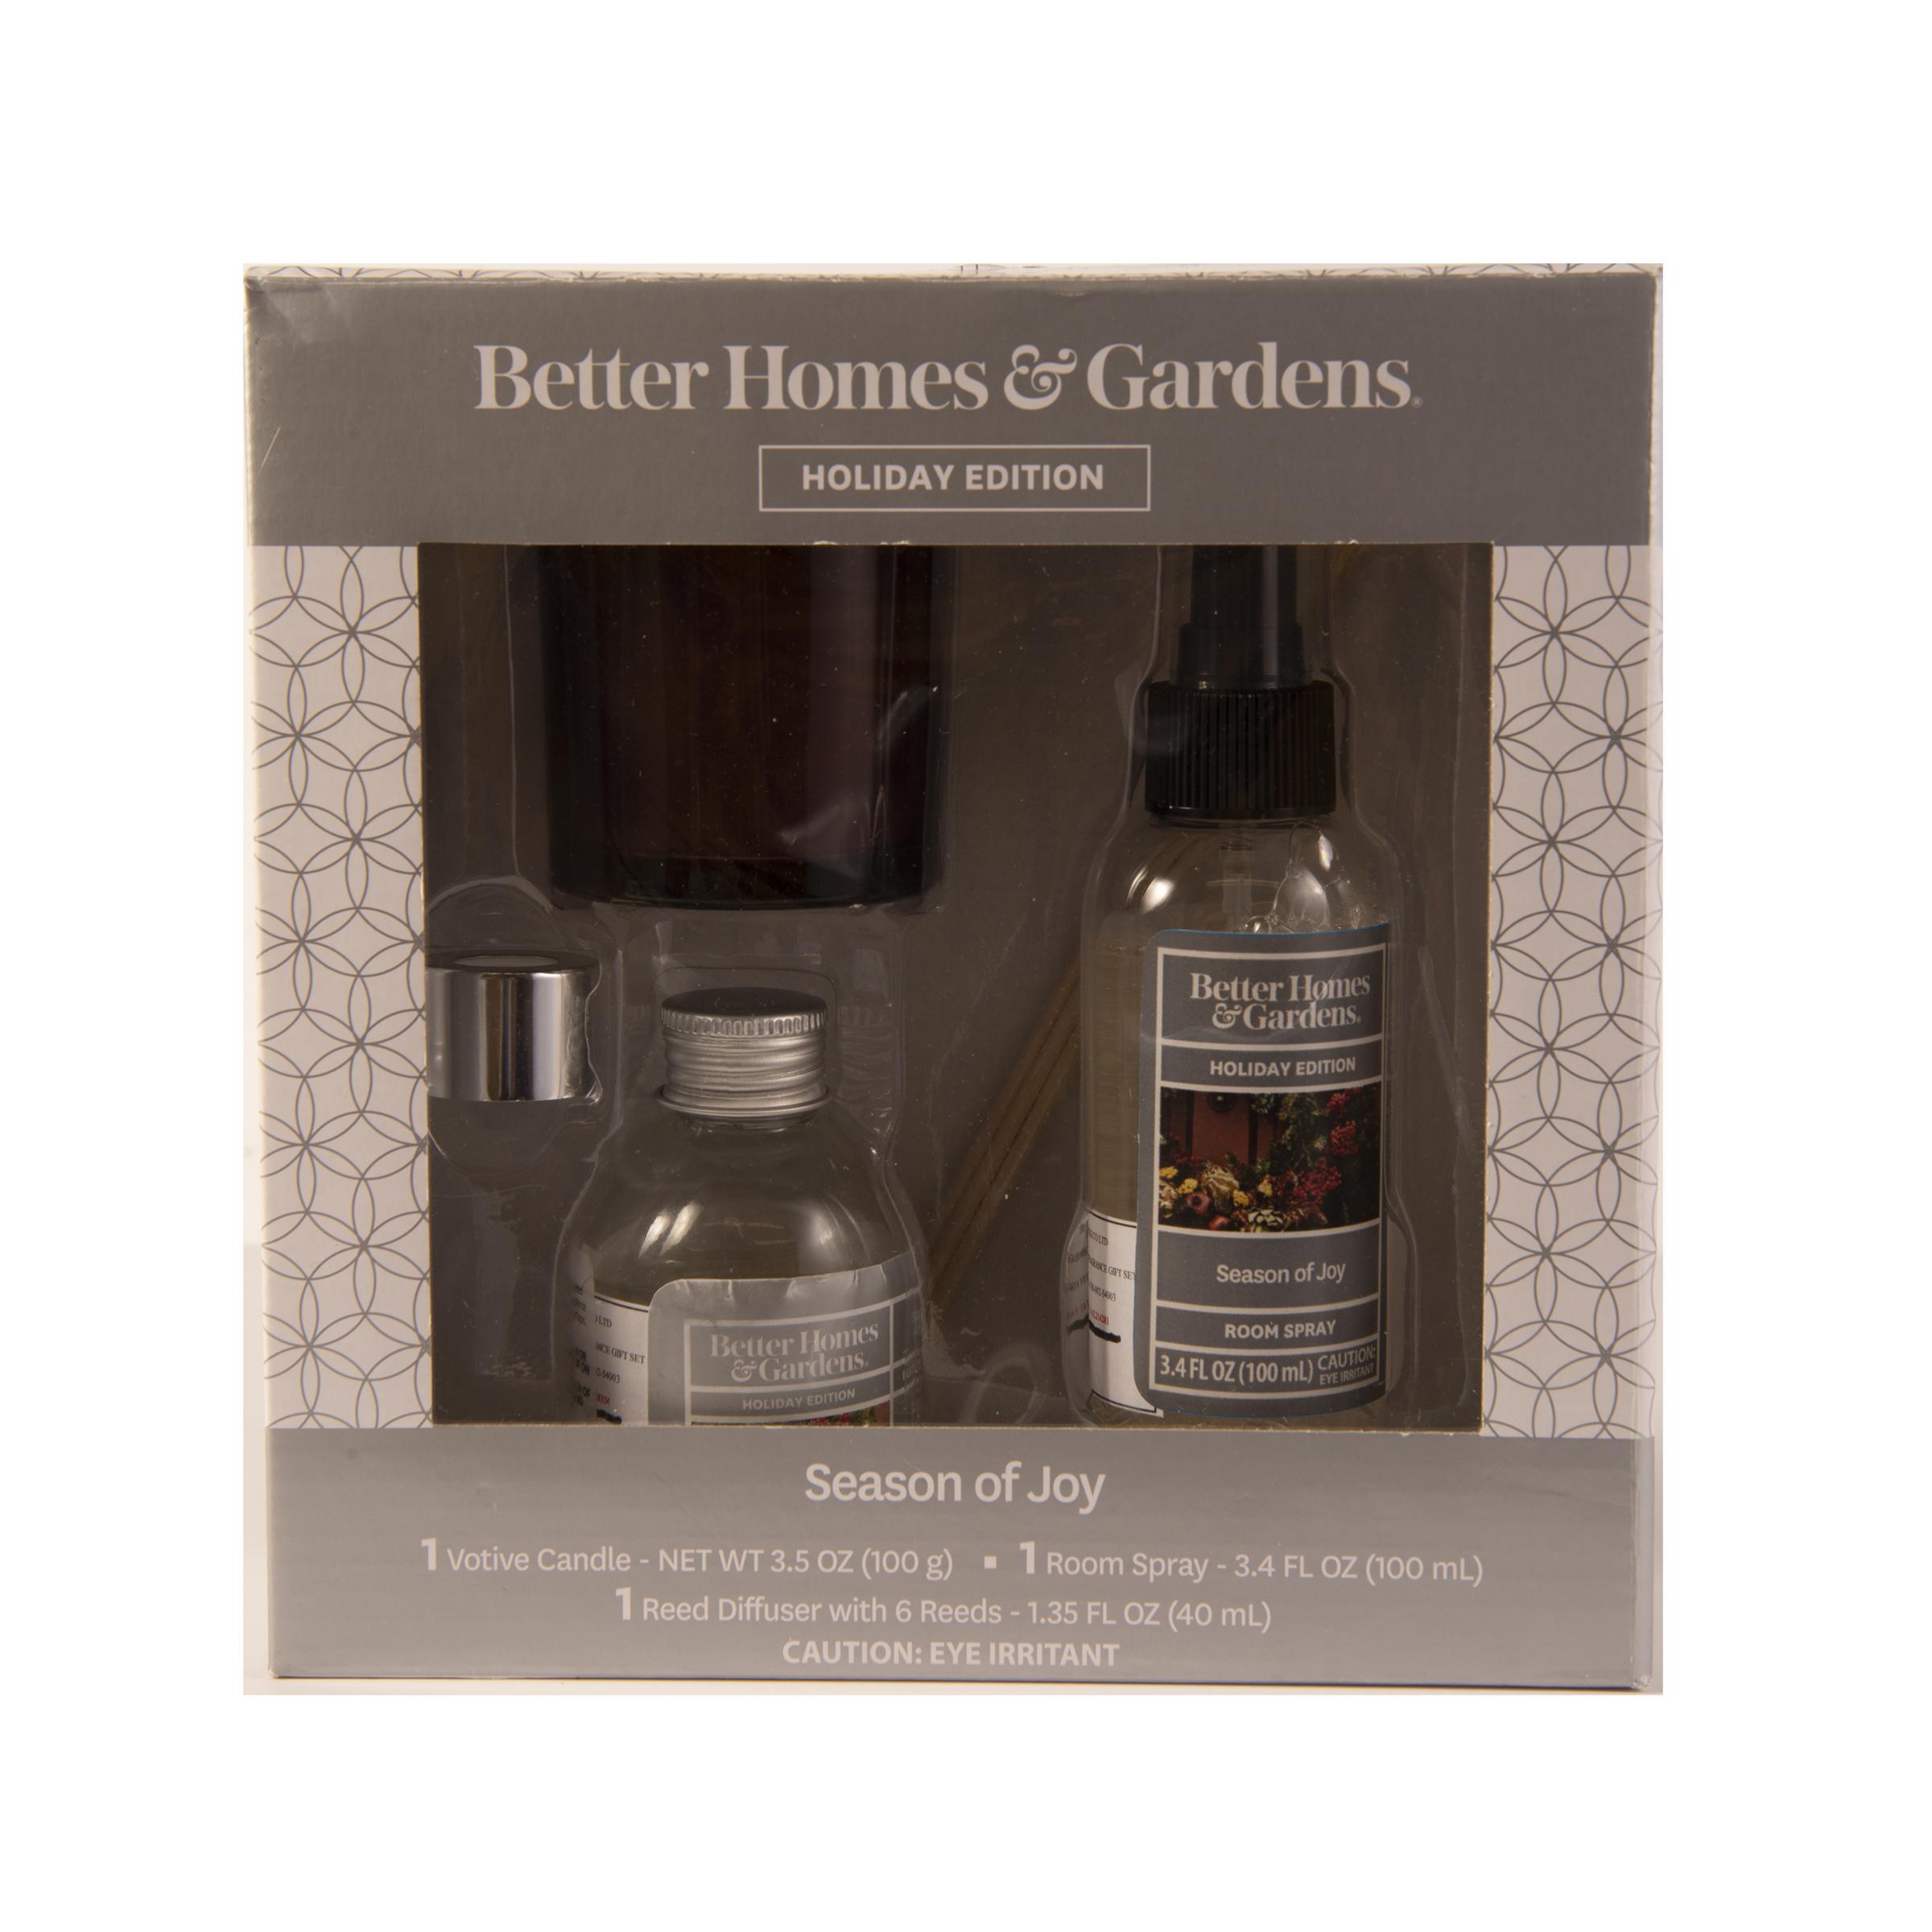 Better Homes & Gardens 3 Piece Seasons of Joy Home Fragrance Gift Set